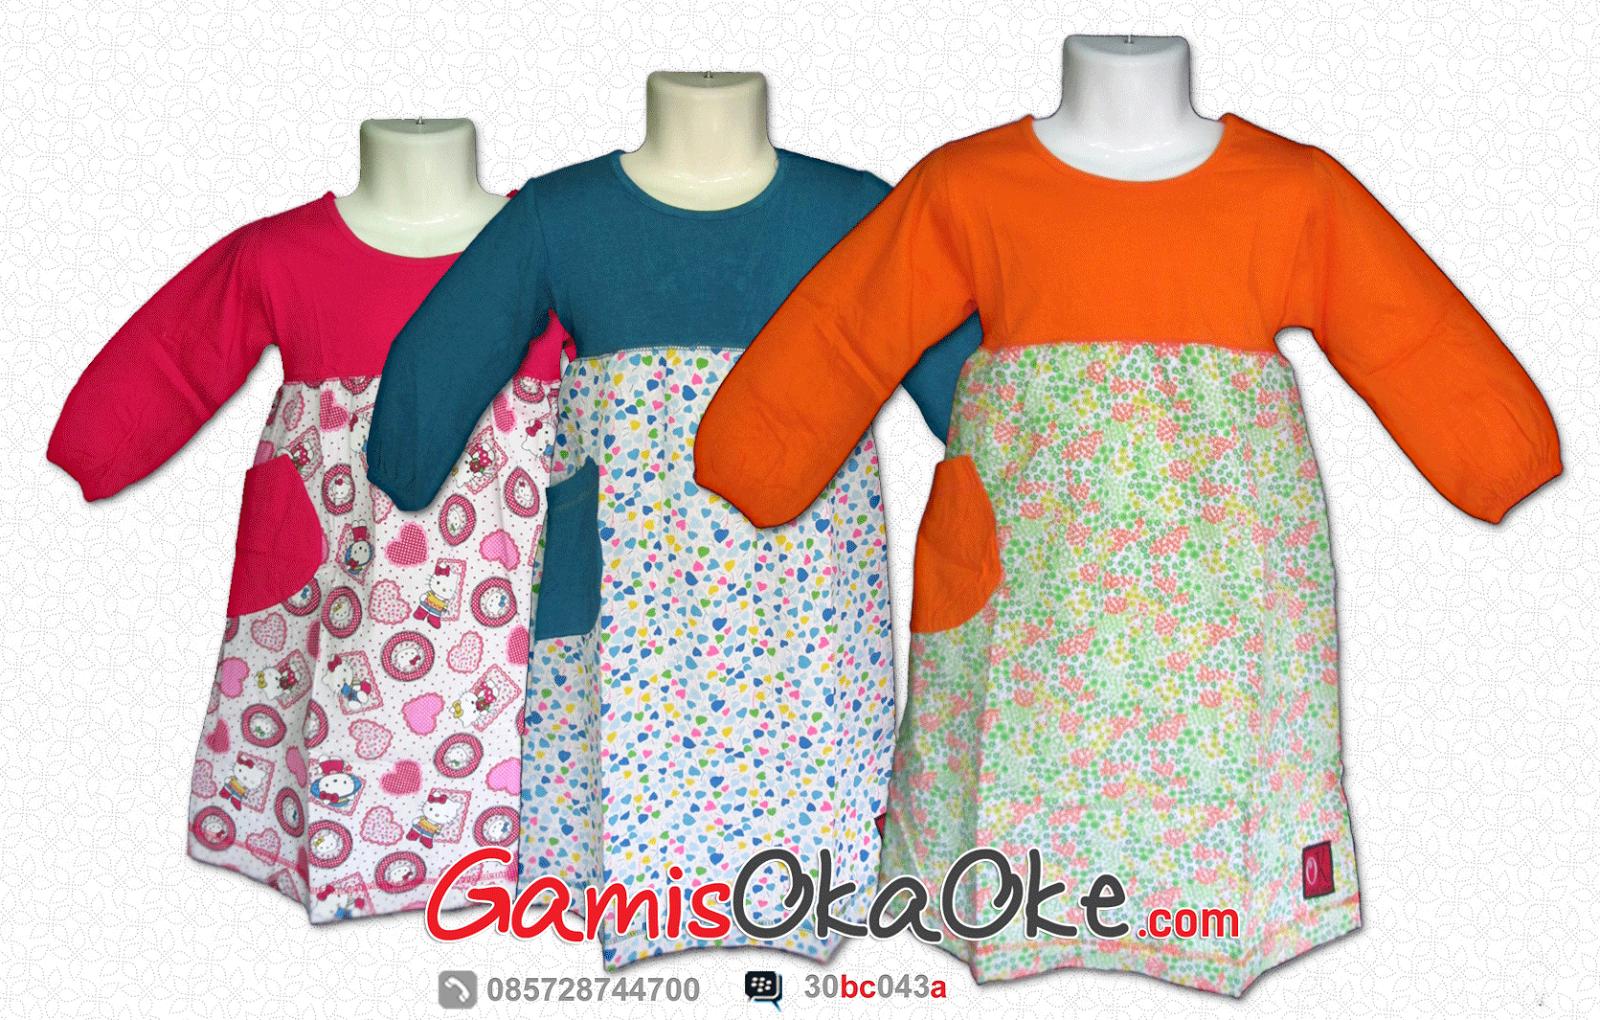 Model Baju Anak Balita Perempuan Baju Anak Lucu Toko Bunda Online Grosir Baju Muslim Model Gamis Untuk Anak Perempuan Dan Balita Model